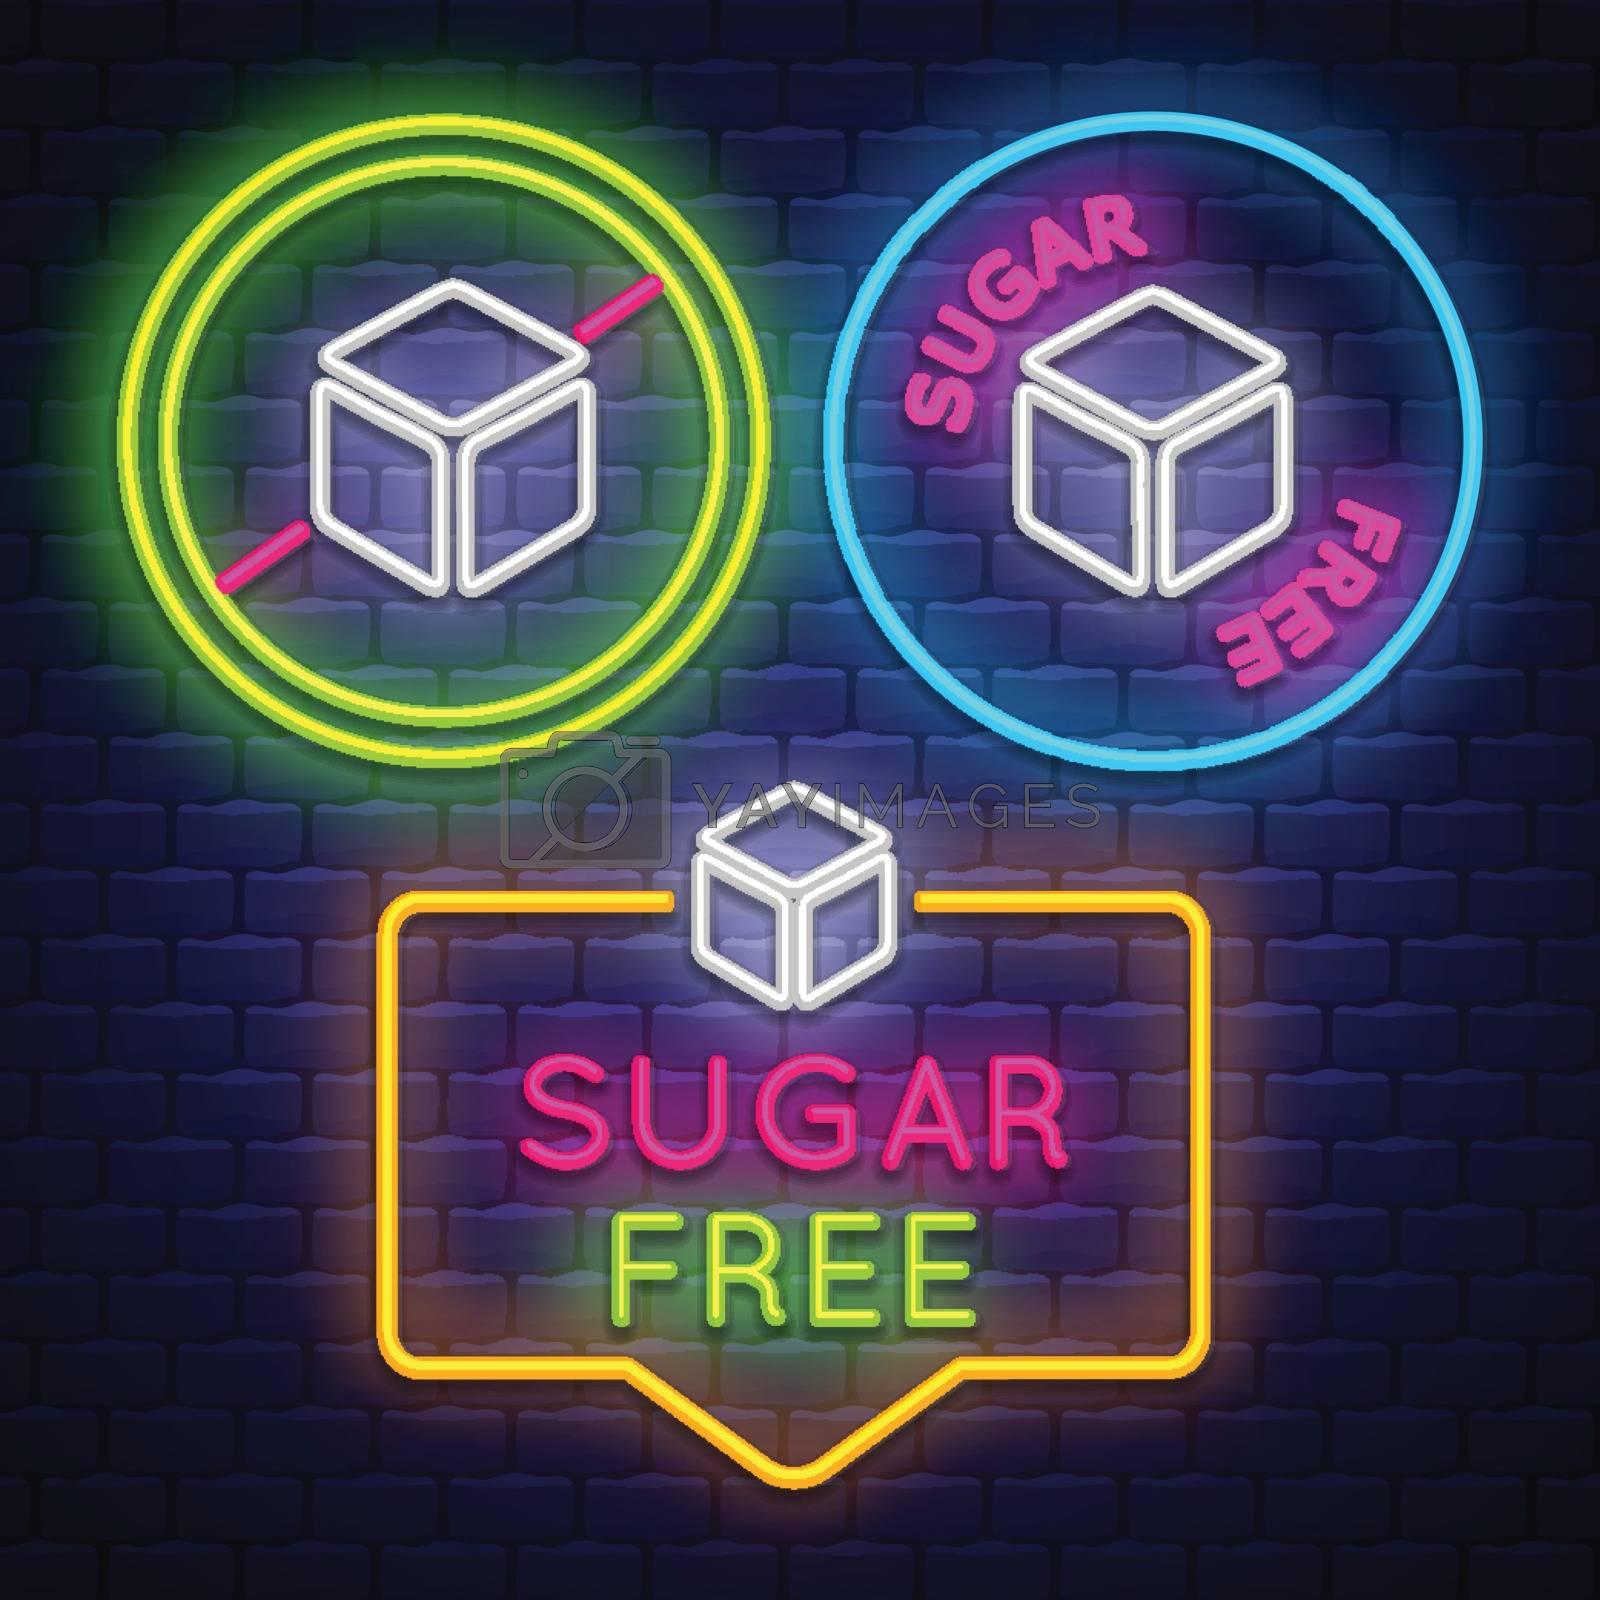 Sugar Free badge collection . Diabet sign. Neon sign. Vector